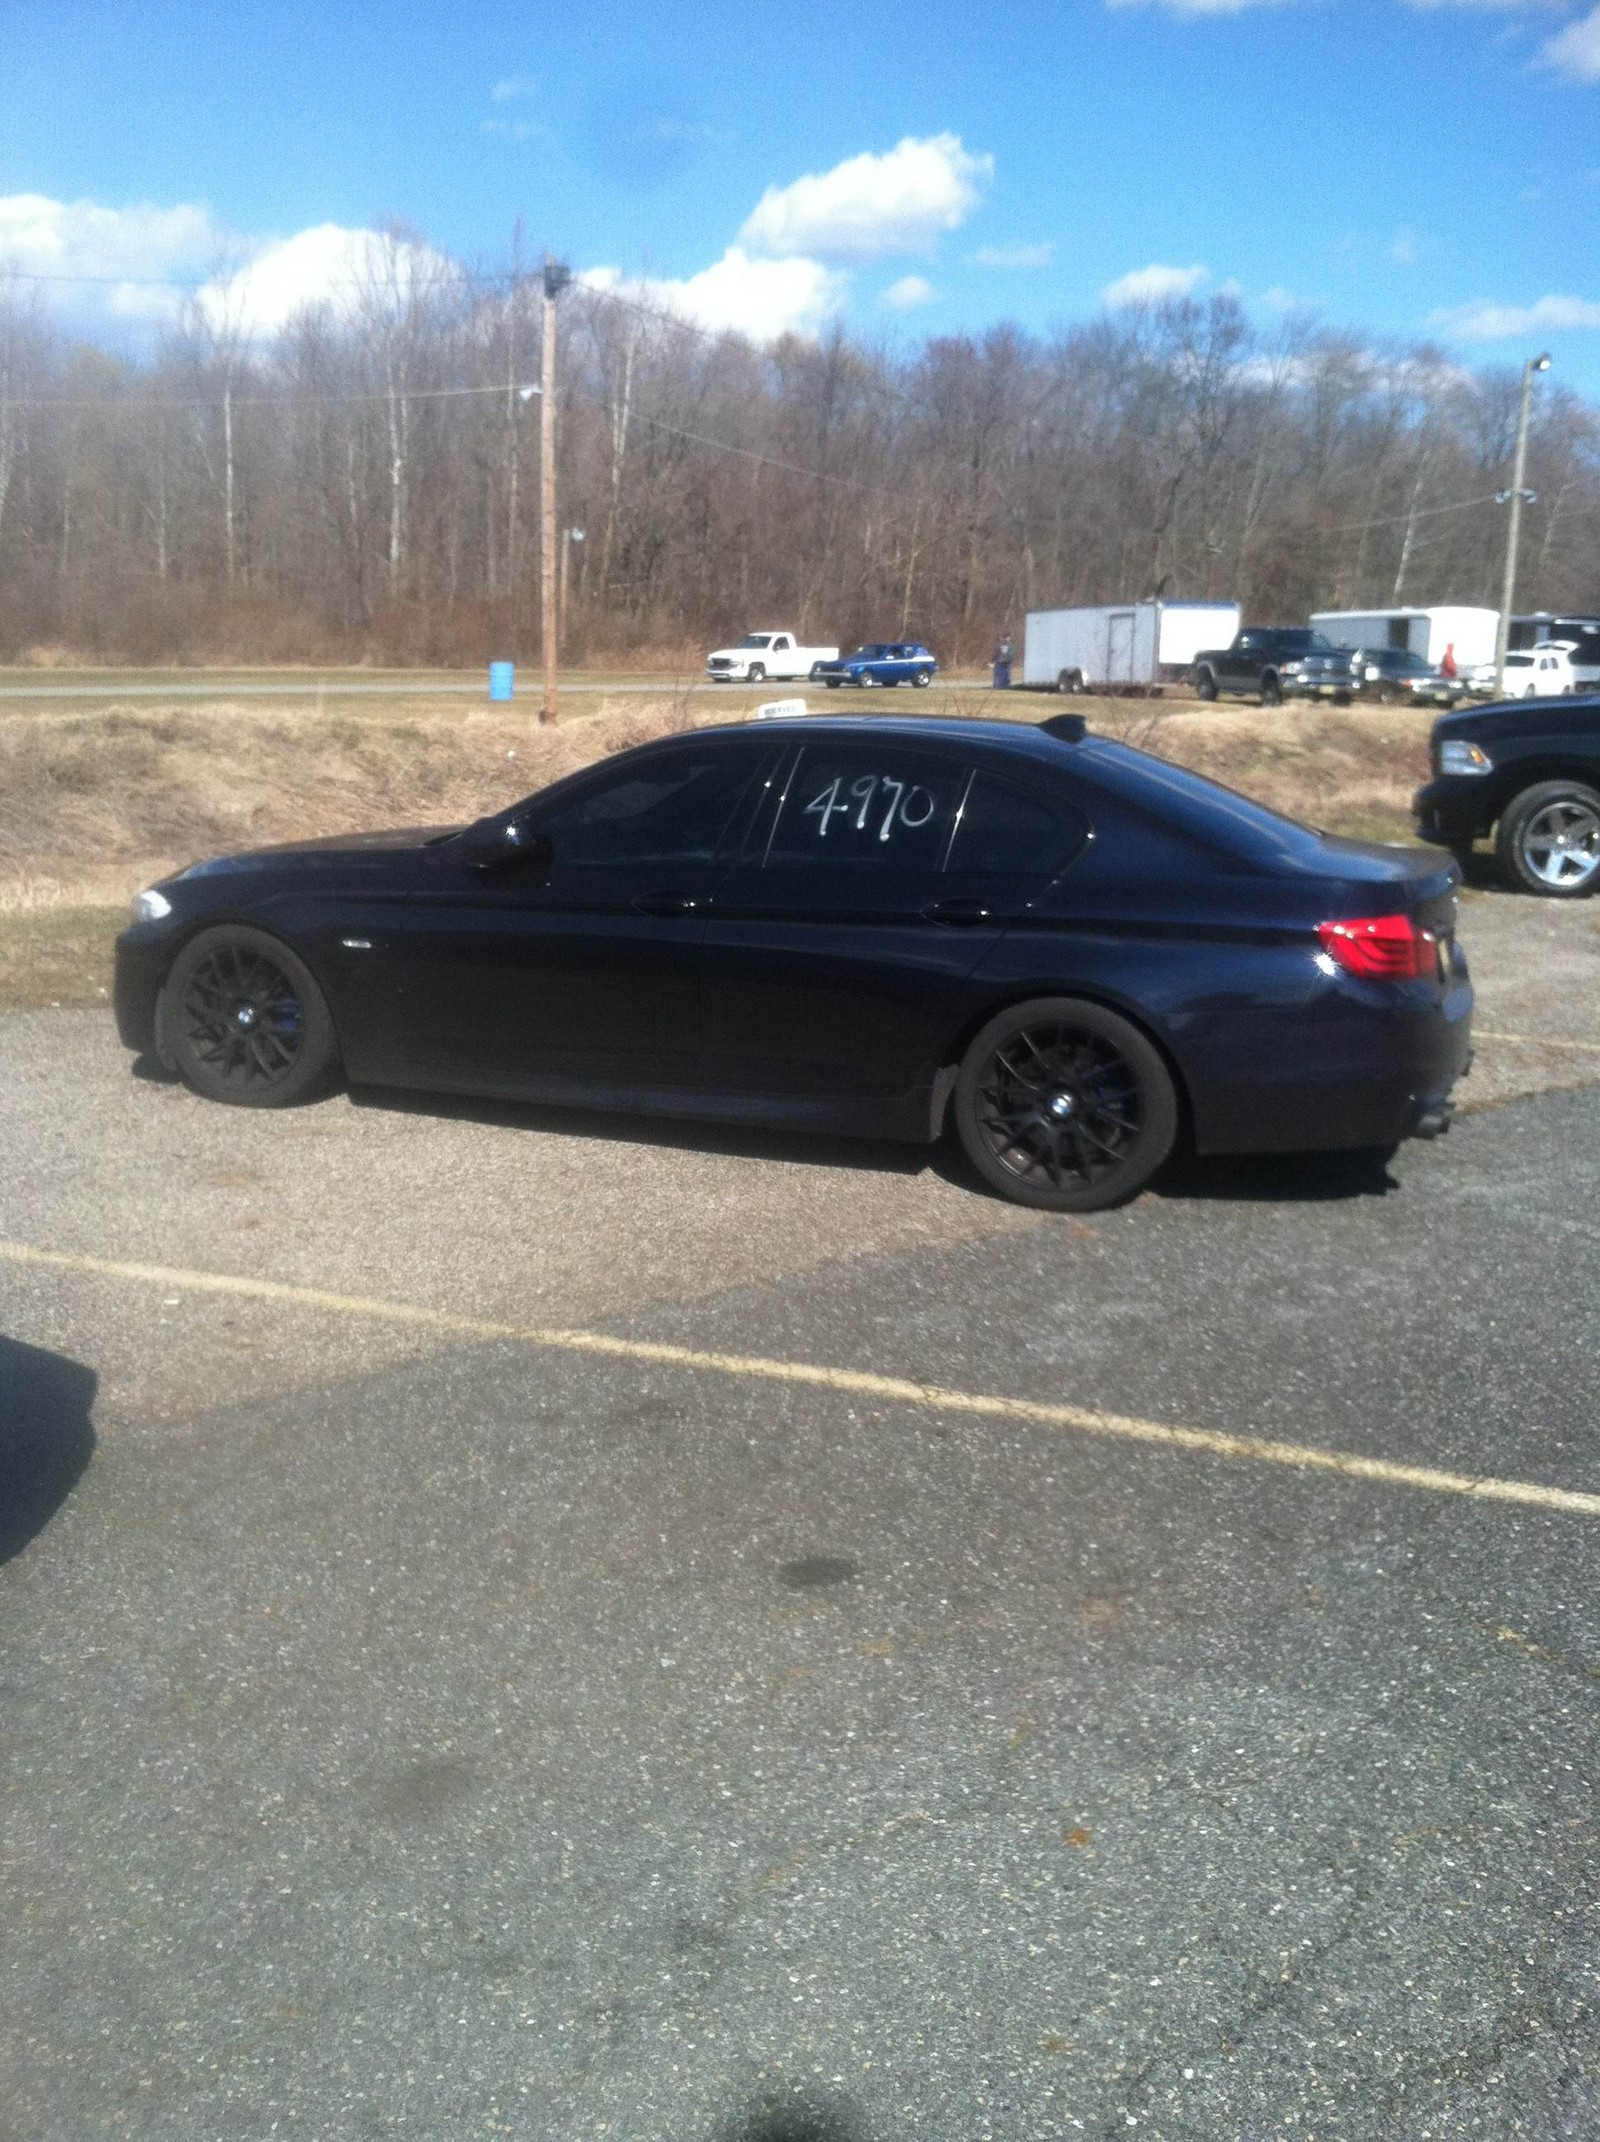 Bmw 550I 0-60 >> 2013 BMW 550i Xi 1/4 mile Drag Racing timeslip specs 0-60 - DragTimes.com